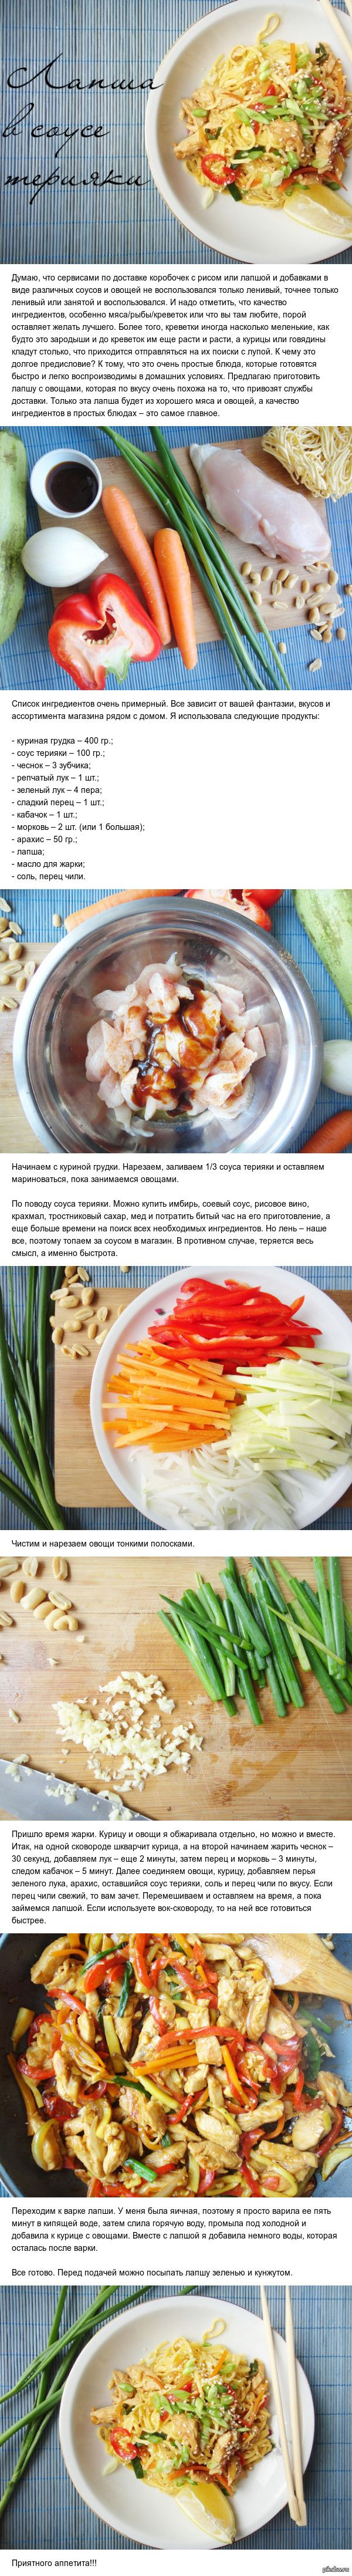 Китайская лапша с курицей в соусе терияки